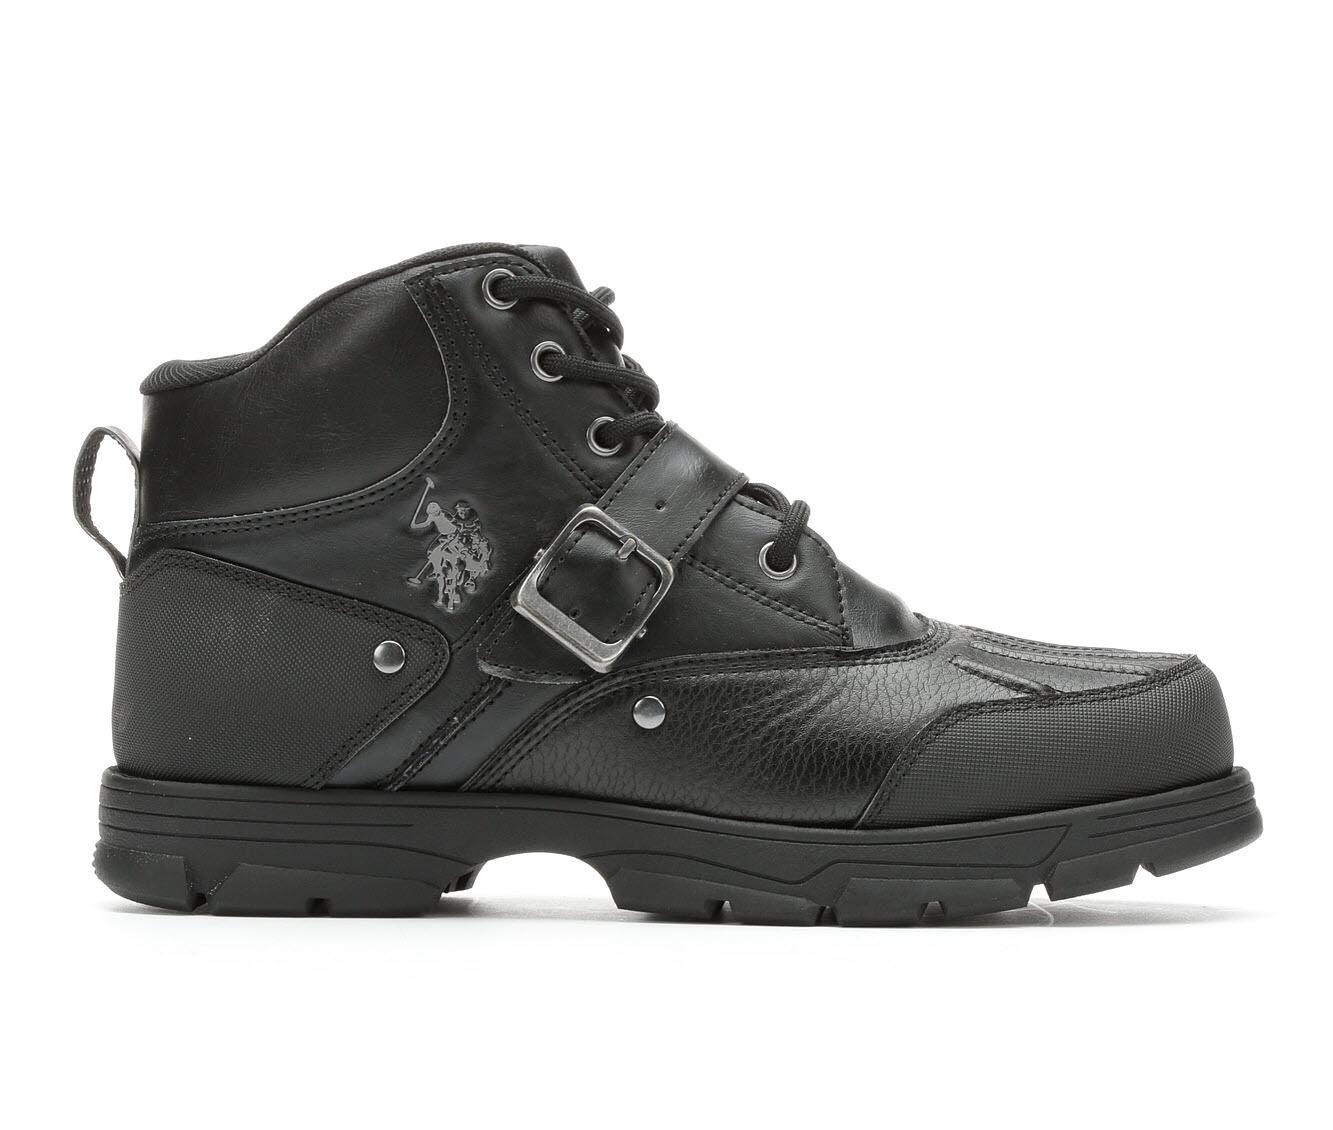 Online Shoe StoreBootsSneakersMore StoreBootsSneakersMore Online StoreBootsSneakersMore Online Shoe Shoe c4jq35ARL